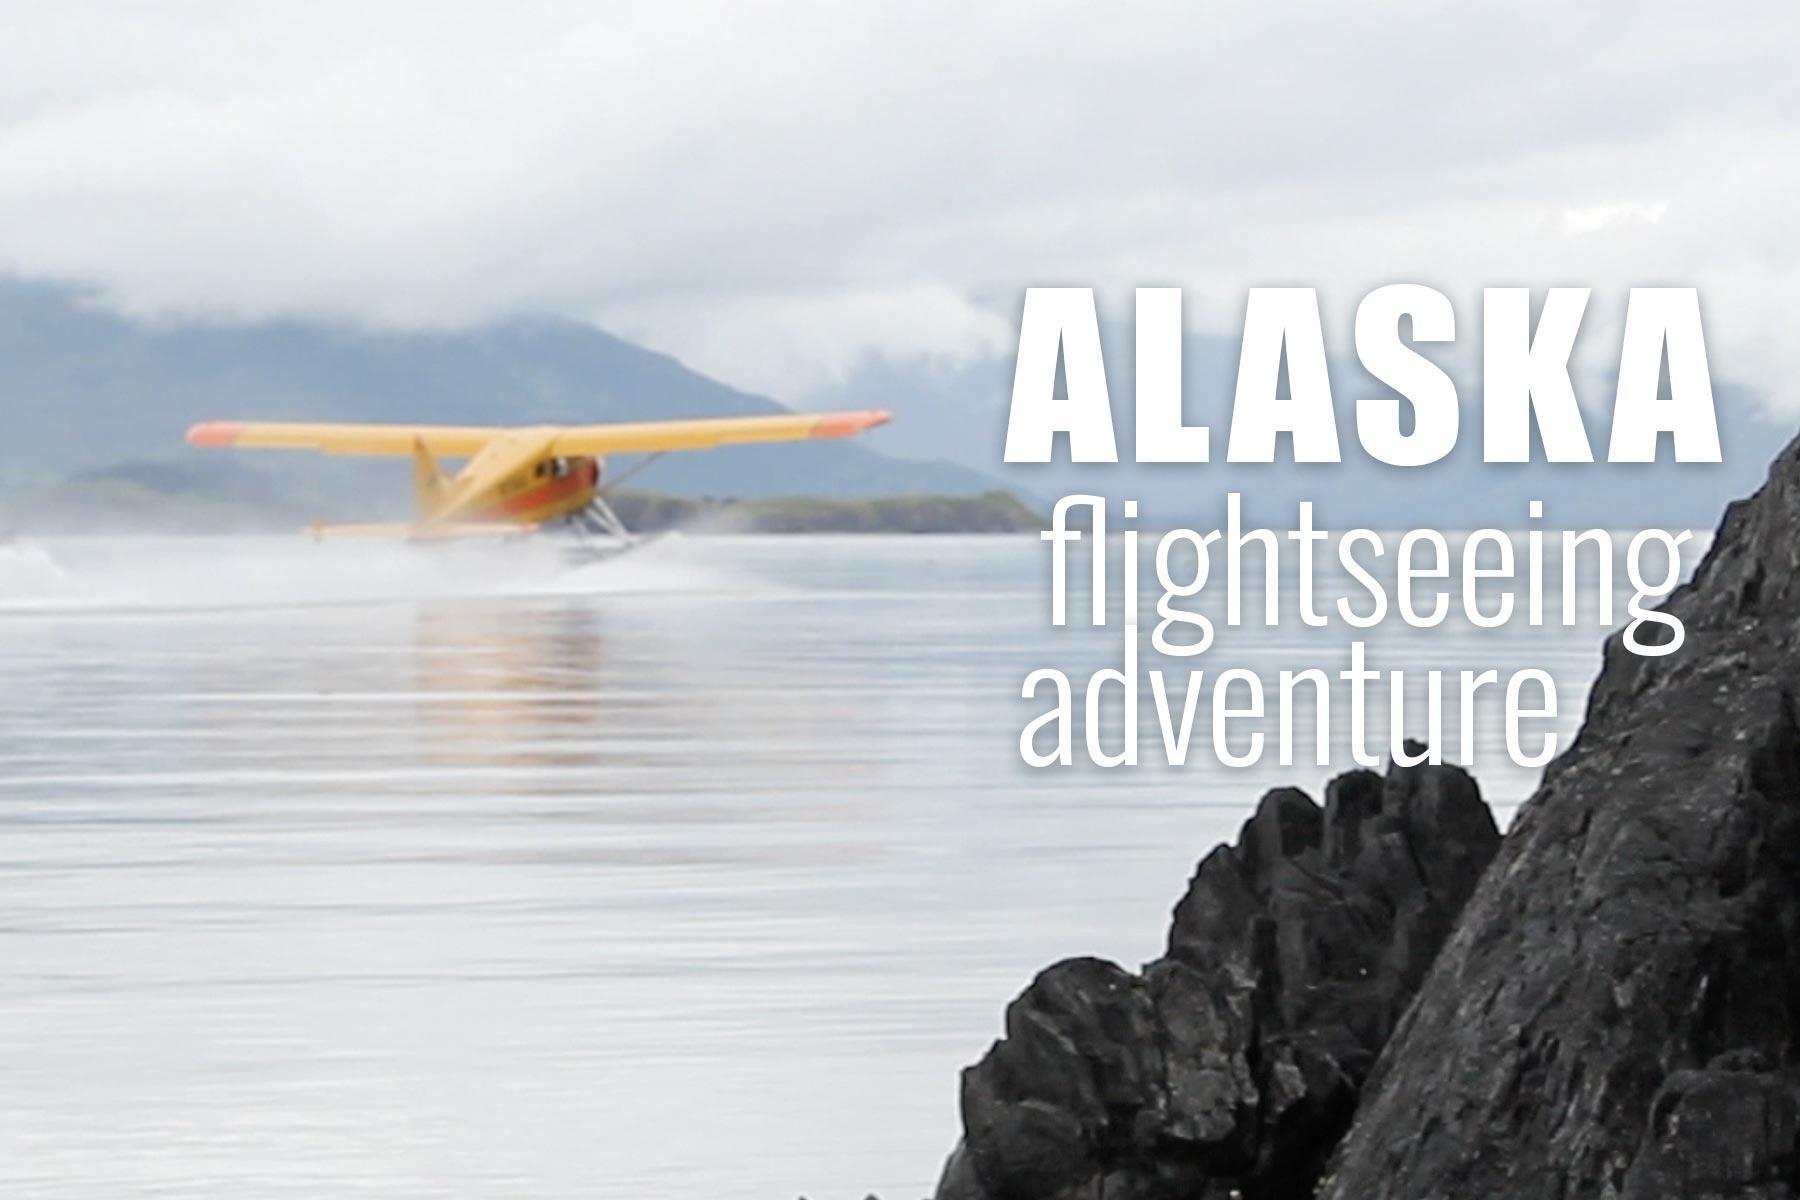 Pilot-narrated aerial flights through untouched Alaska wilderness